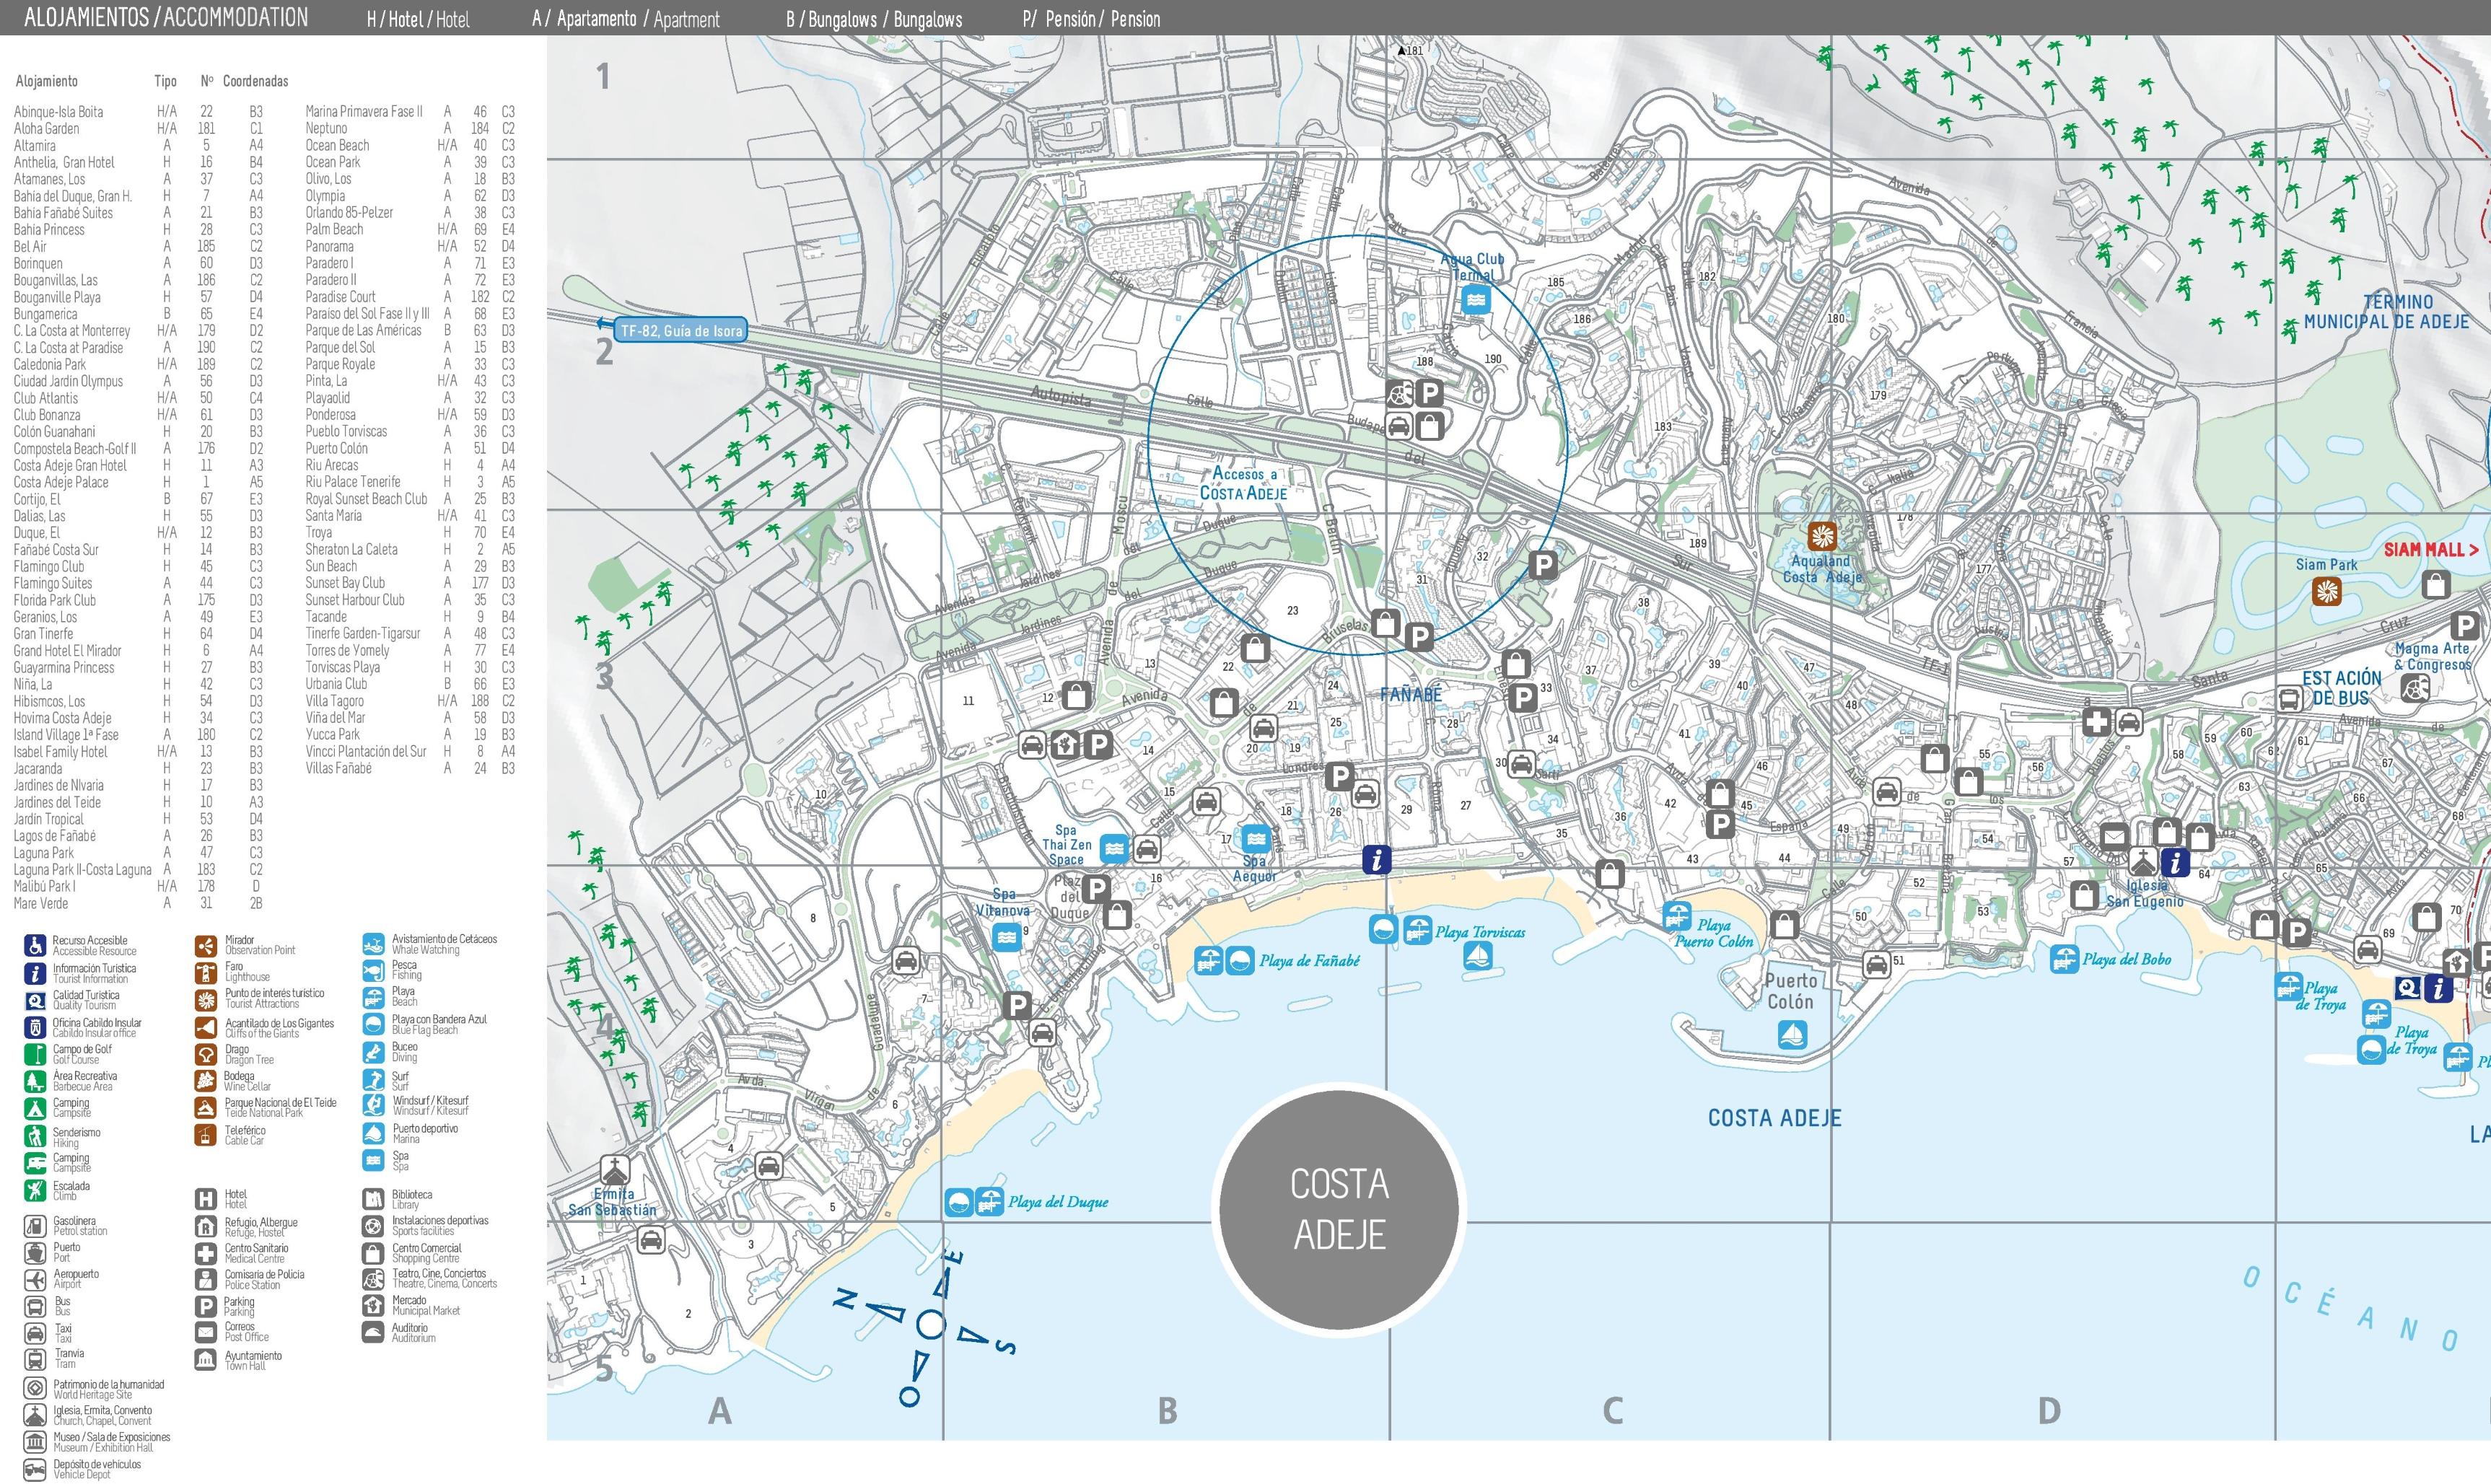 Costa Adeje Maps Spain Maps of Costa Adeje